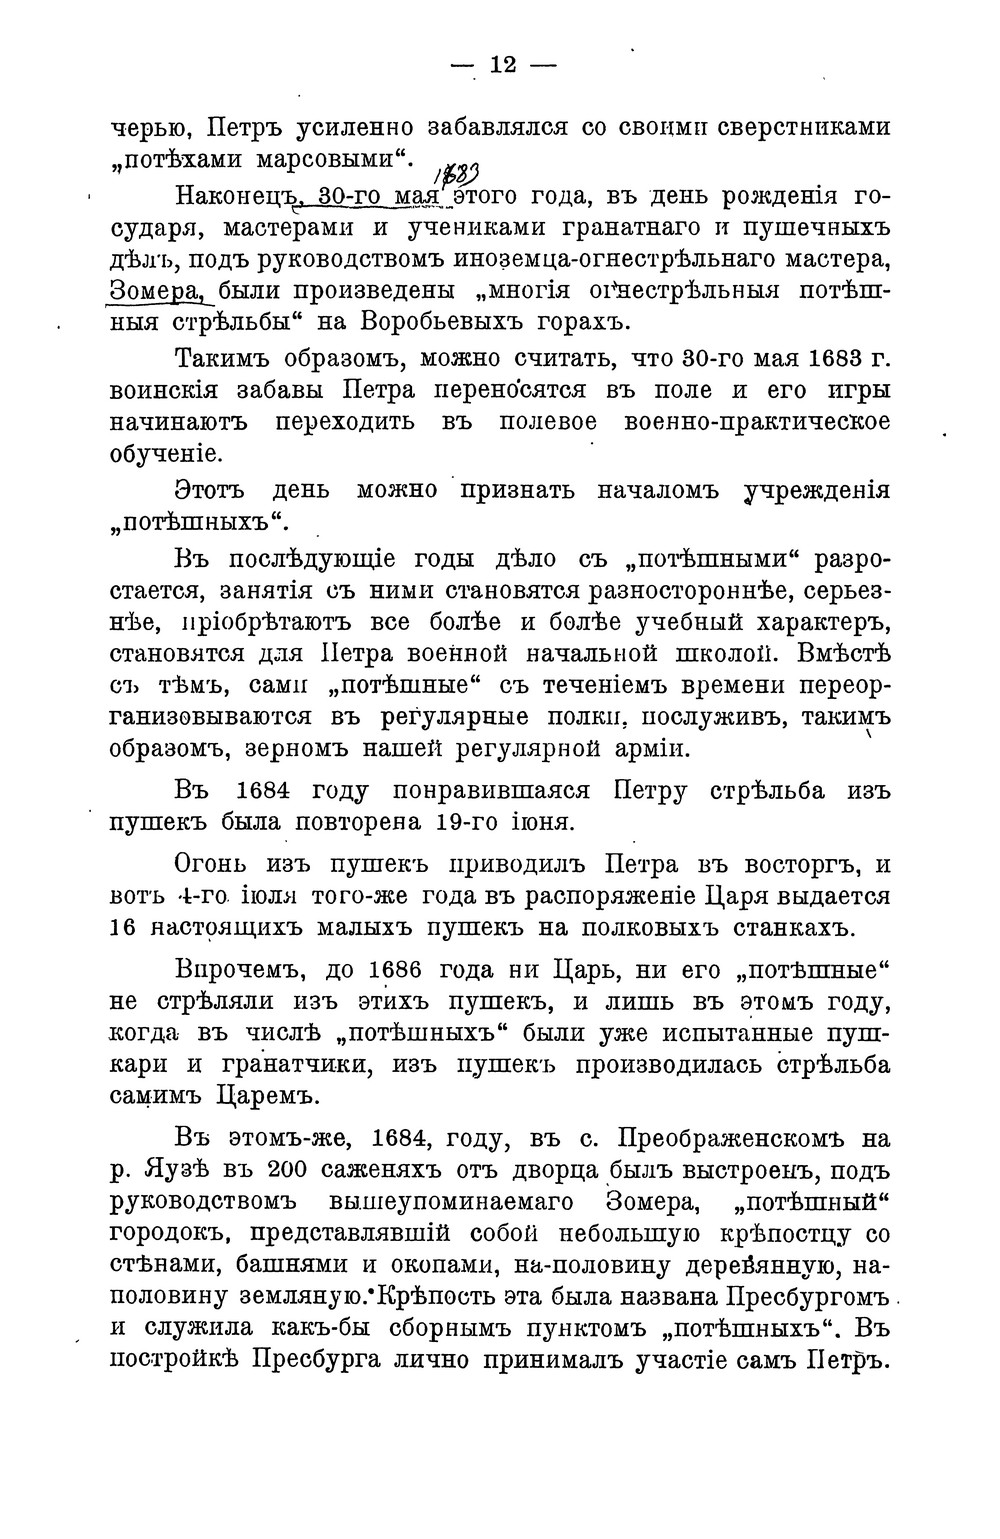 http://i5.imageban.ru/out/2013/11/07/d4178e78473262a6ed3bdfee4397b7de.jpg